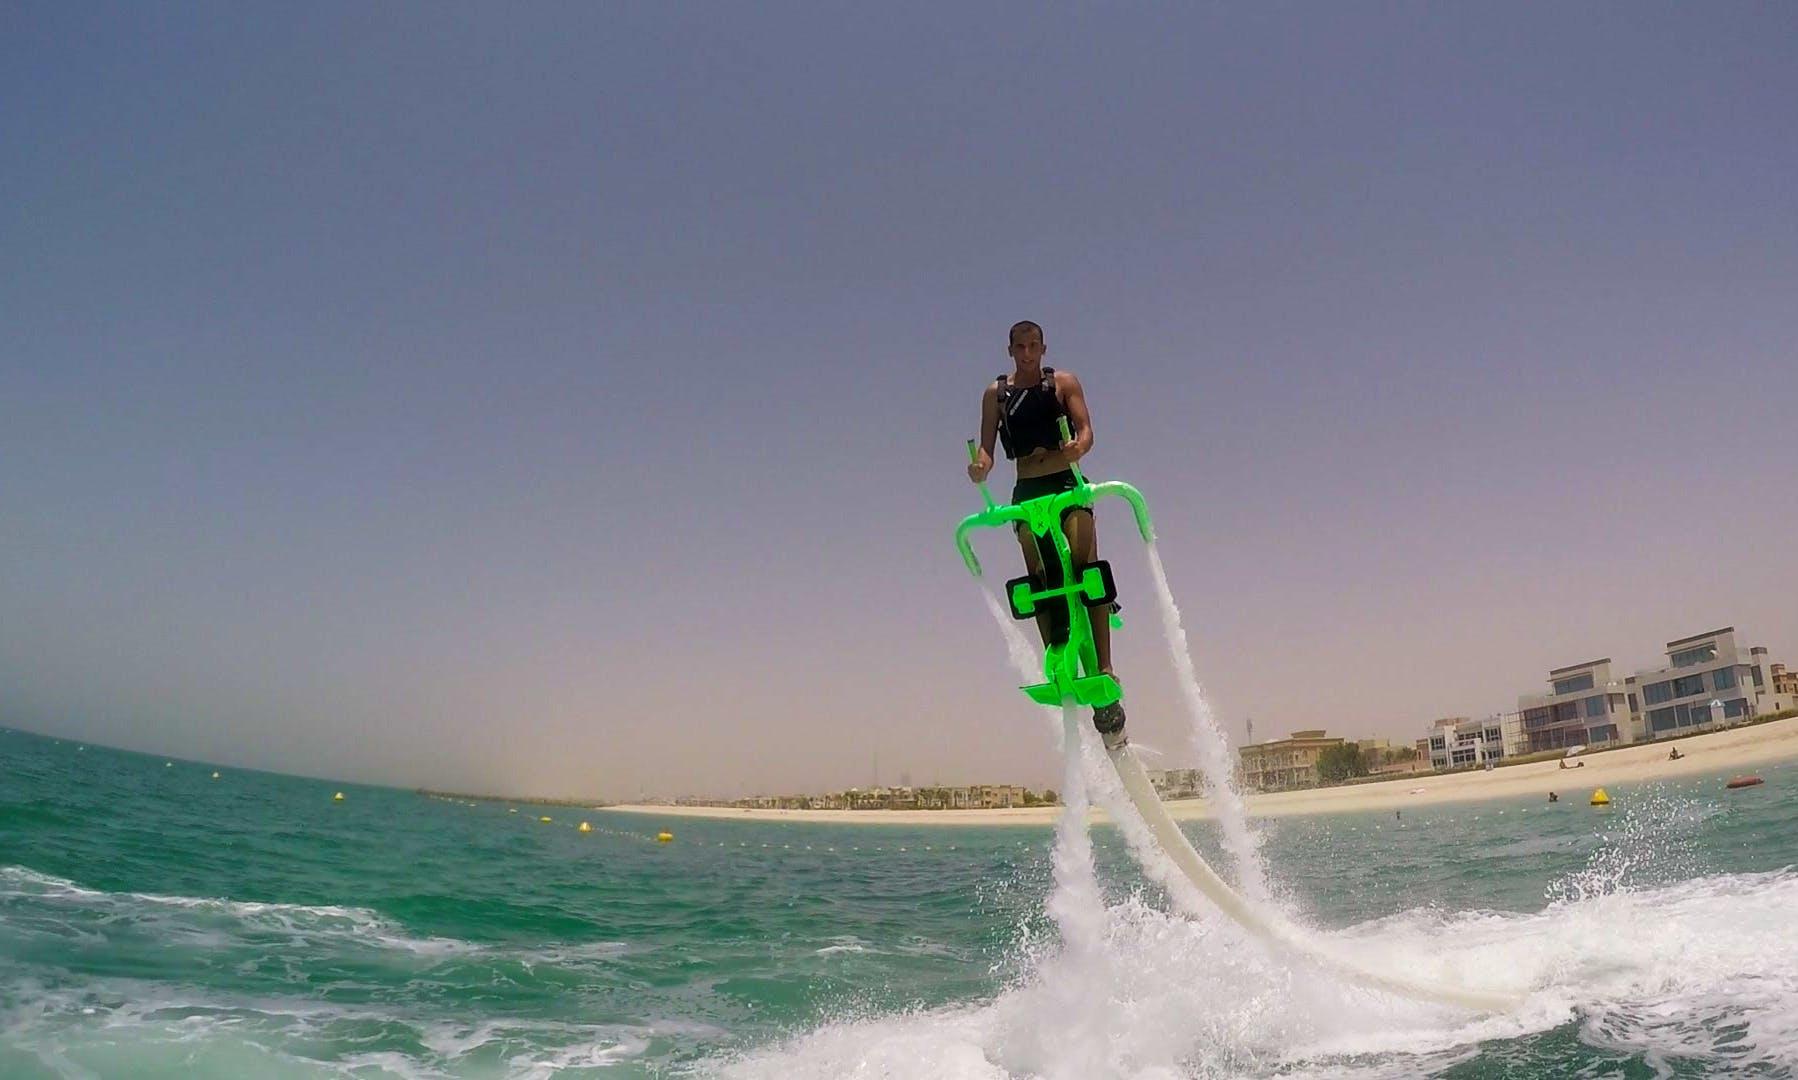 Flyboarding Adventure in Dubai, UAE